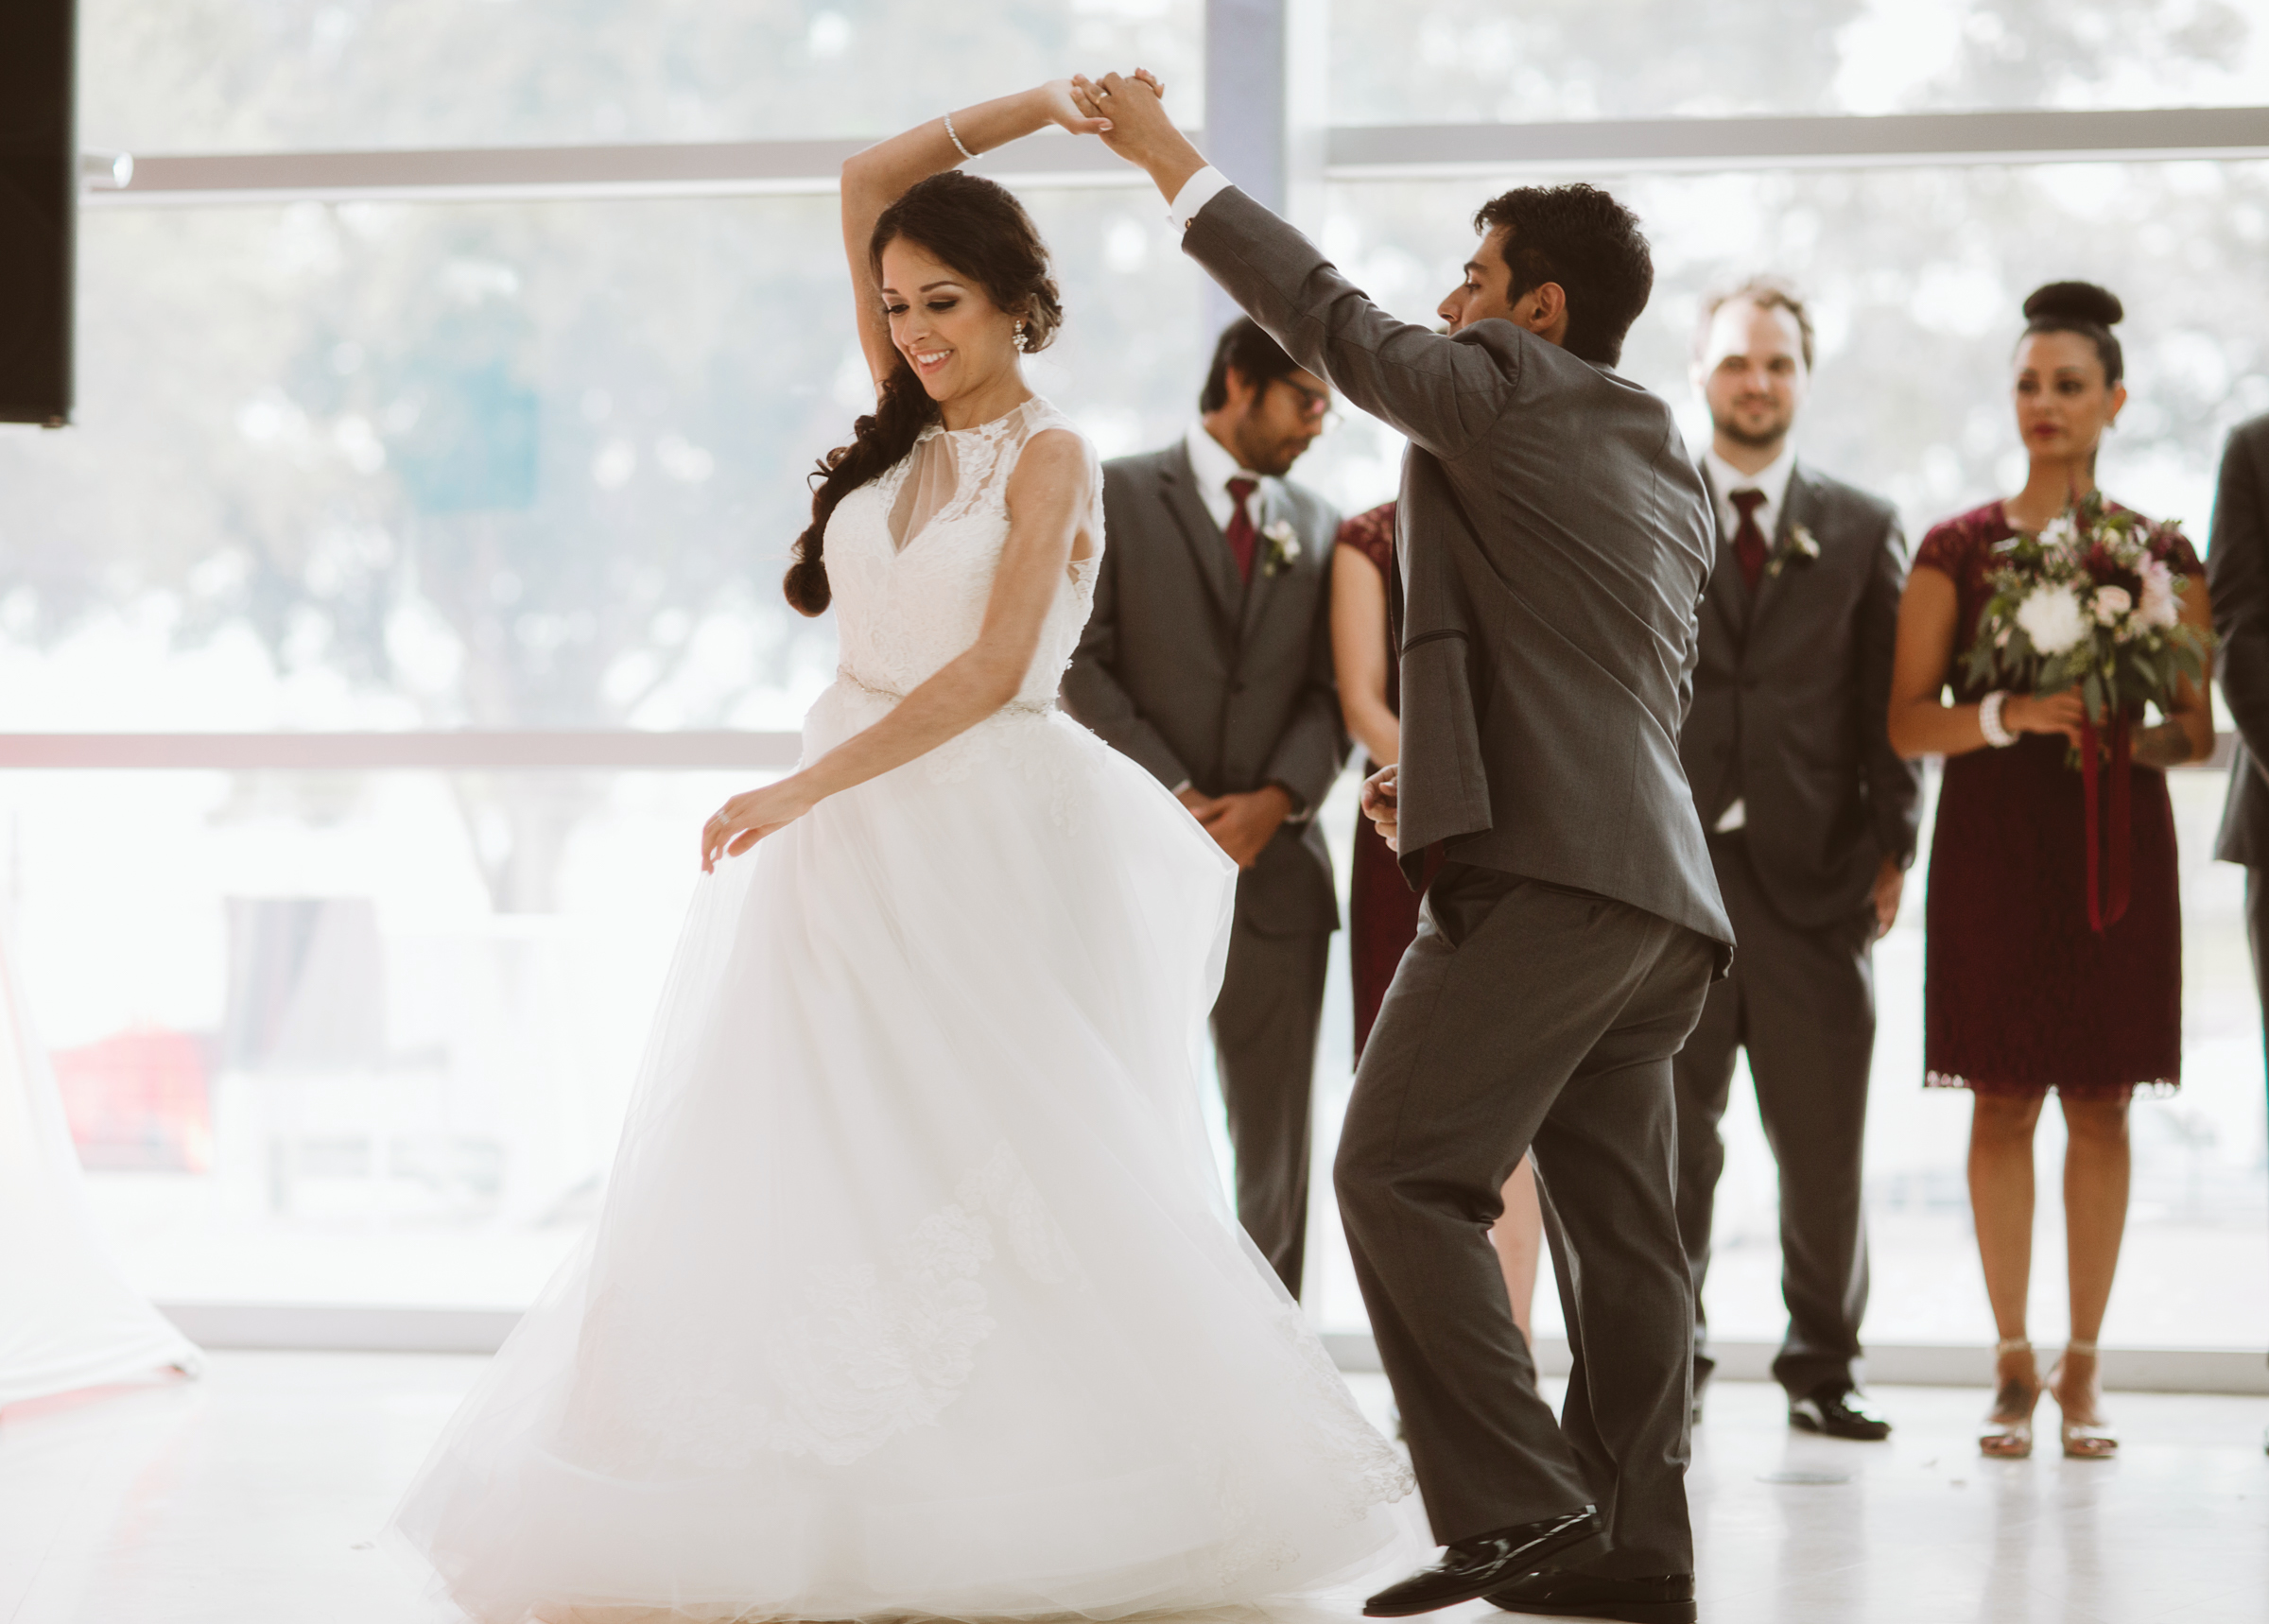 wedding day | MFA St Pete | Vanessa Boy Photography | vanessaboy.com-530.com |final.jpg